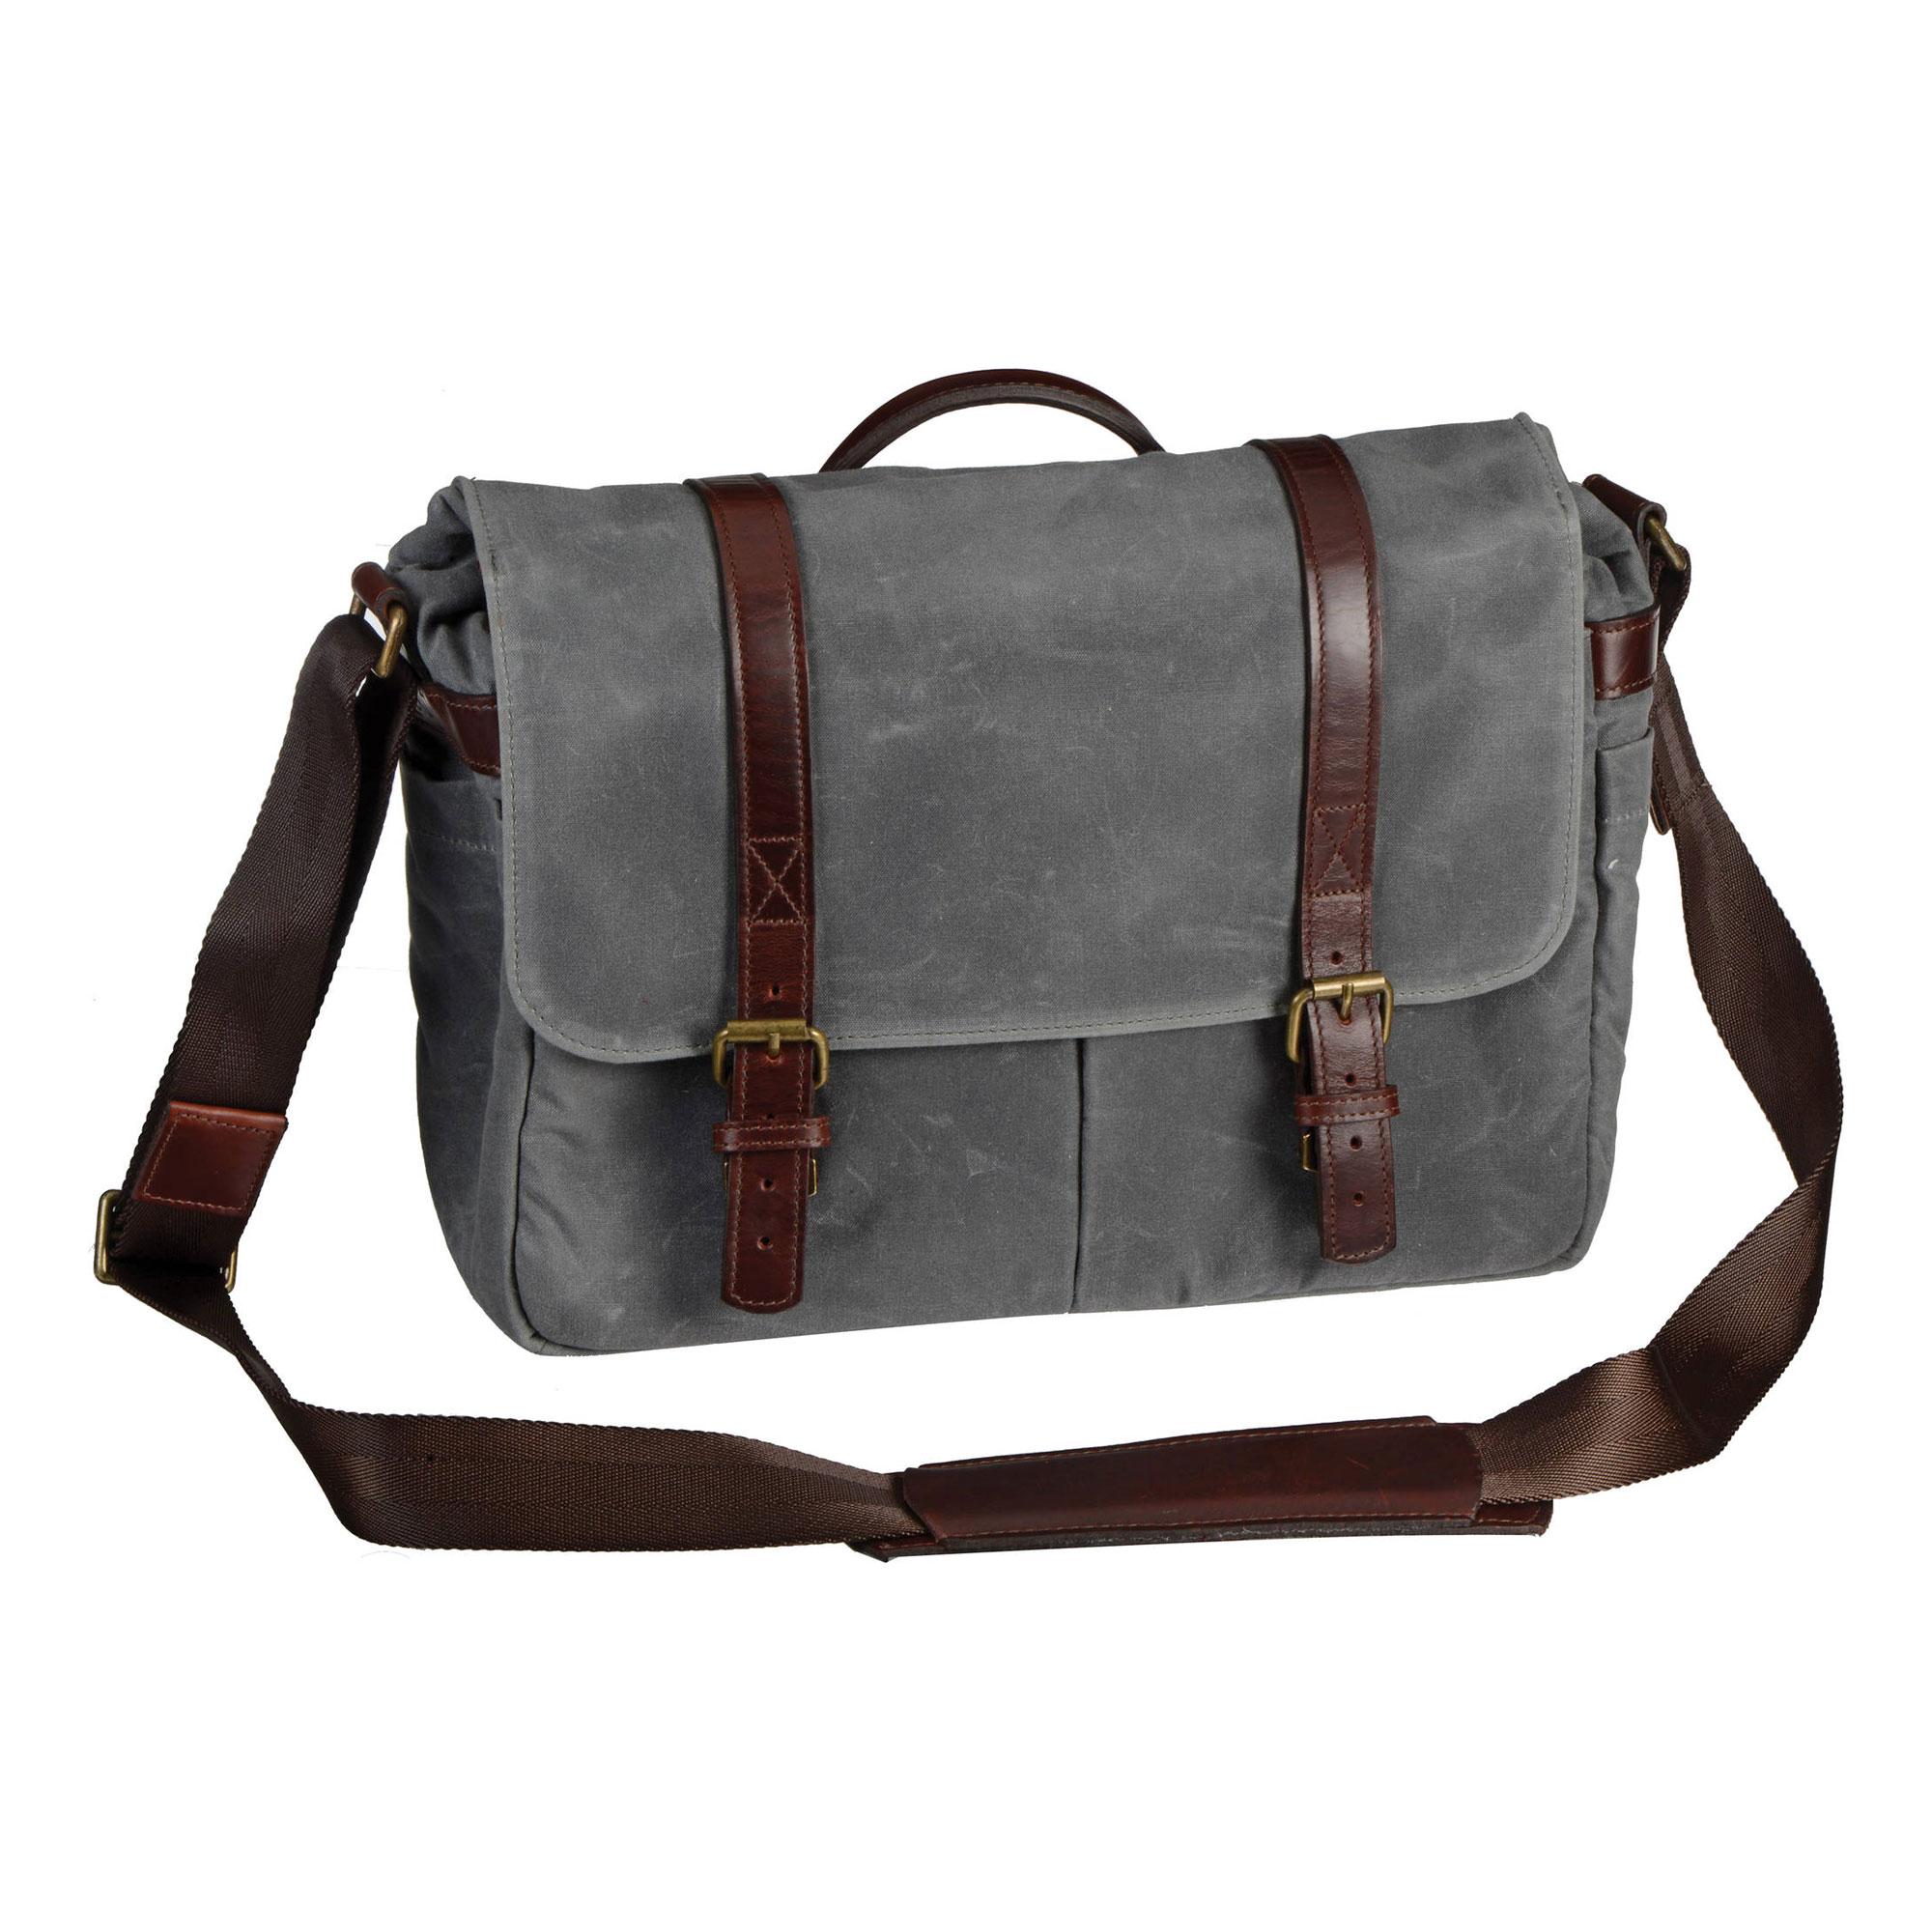 Image of Ona Bags The Brixton Camera/Laptop Messenger Bag (Smoke)